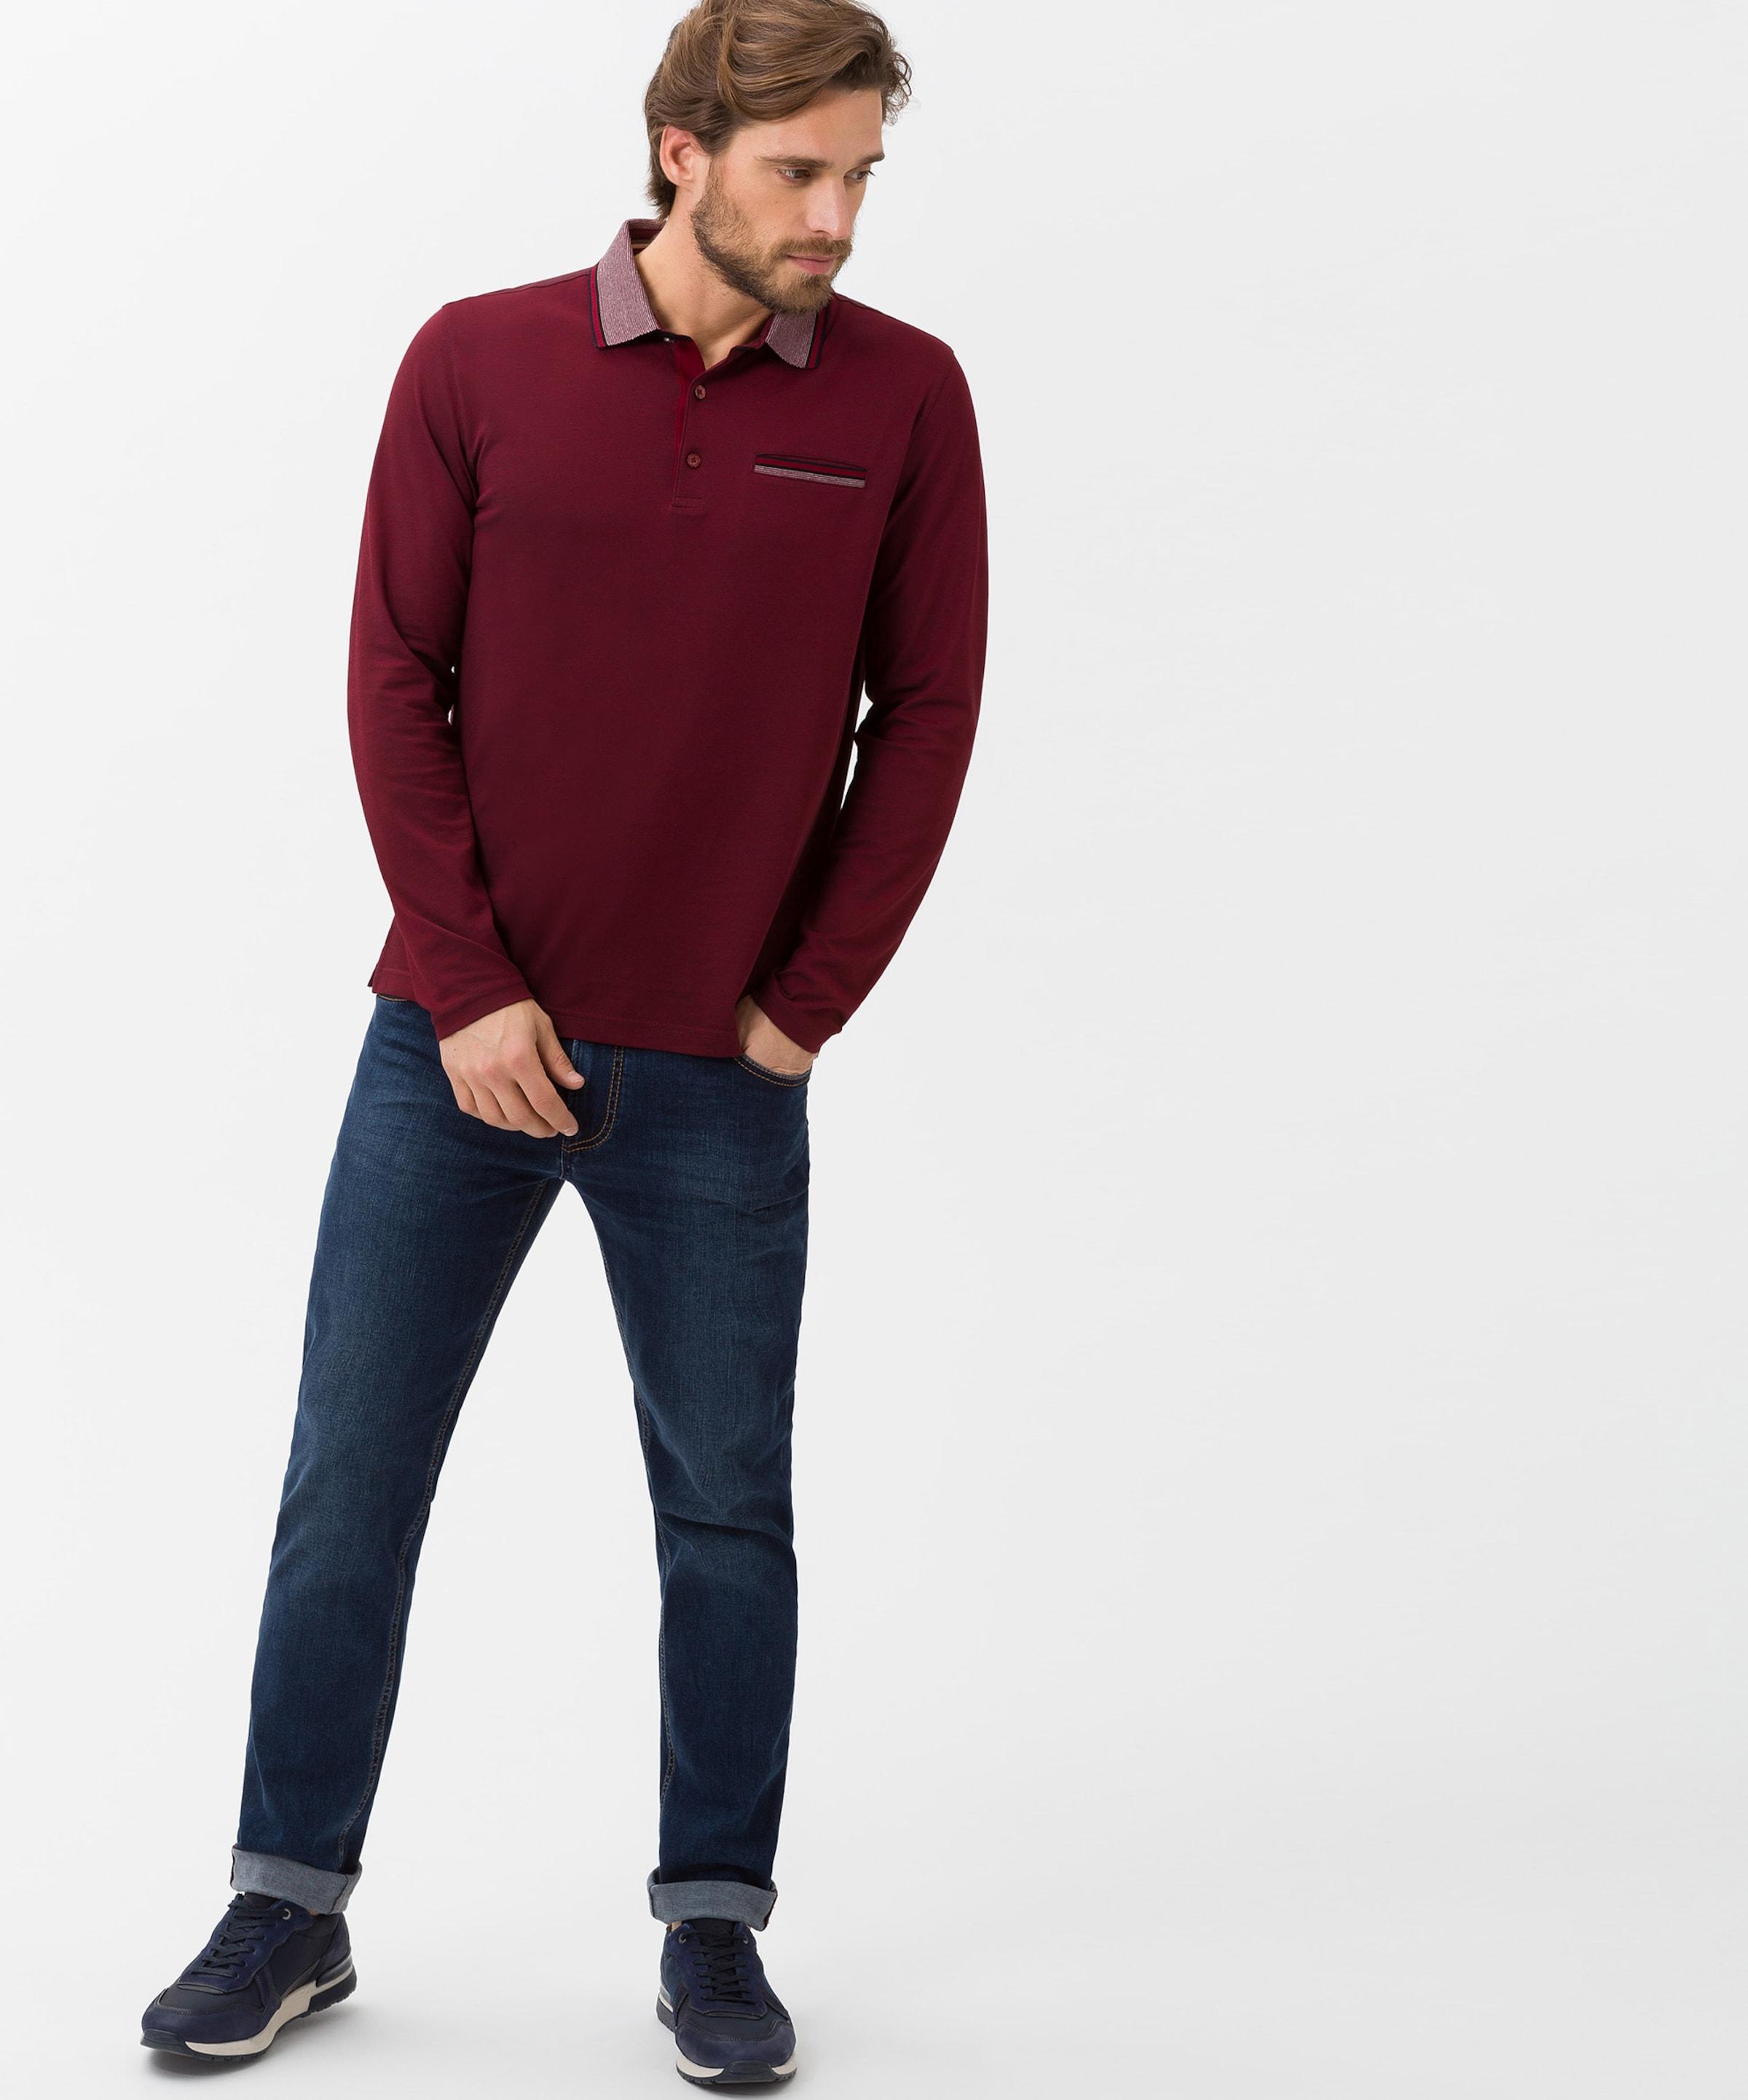 'pharell' 'pharell' Shirt Brax Shirt Brax Shirt Brax In Bordeaux In Bordeaux q354RLAj